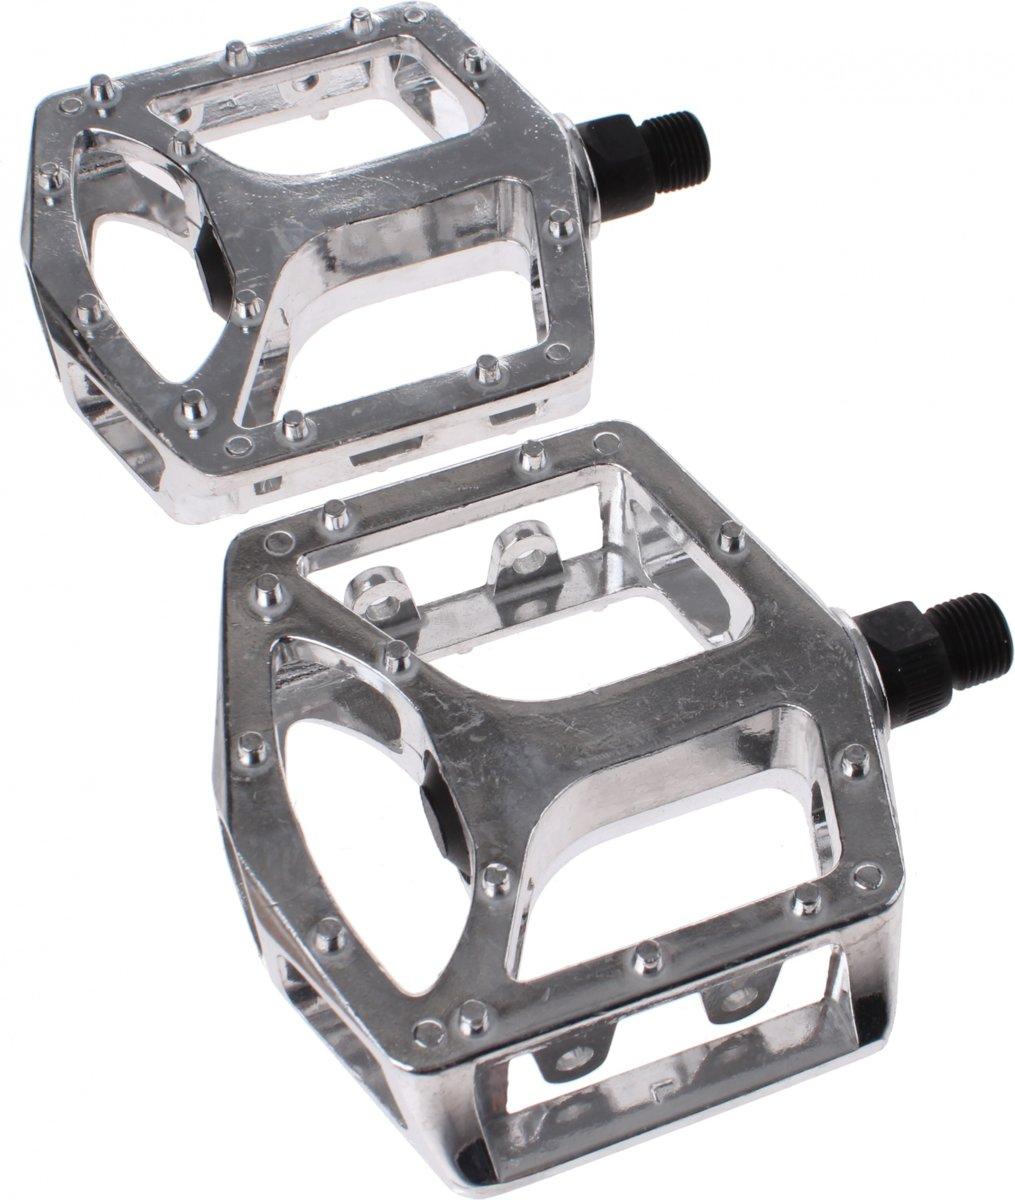 Cycle Tech platformpedalen set 1/2 inch BMX zilver